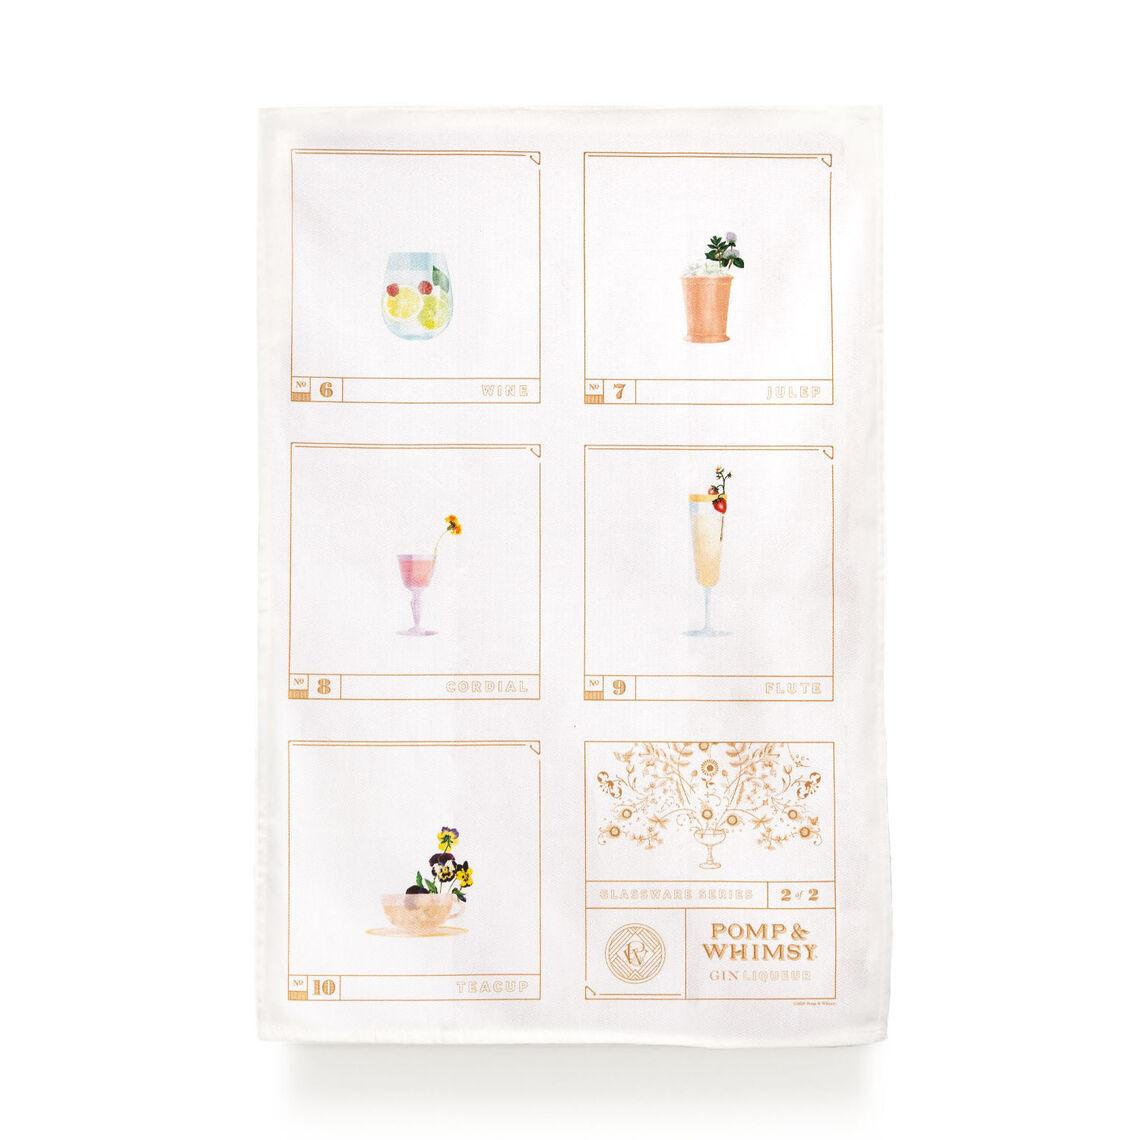 pw shop tea towel glassware set 2sq